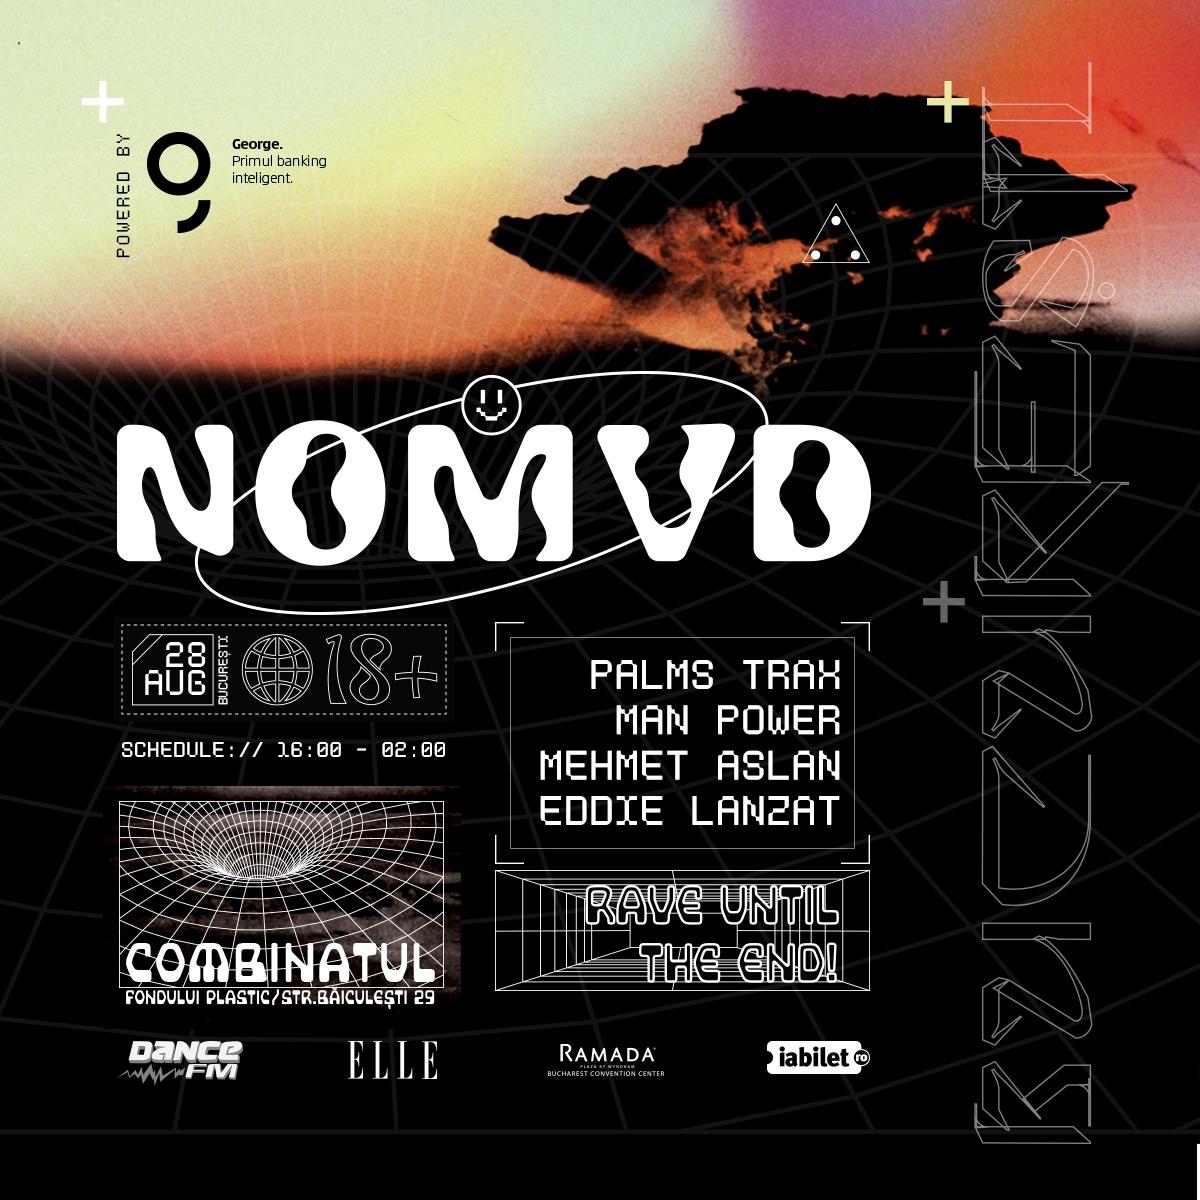 NOMVD, the post-apocalyptic rave